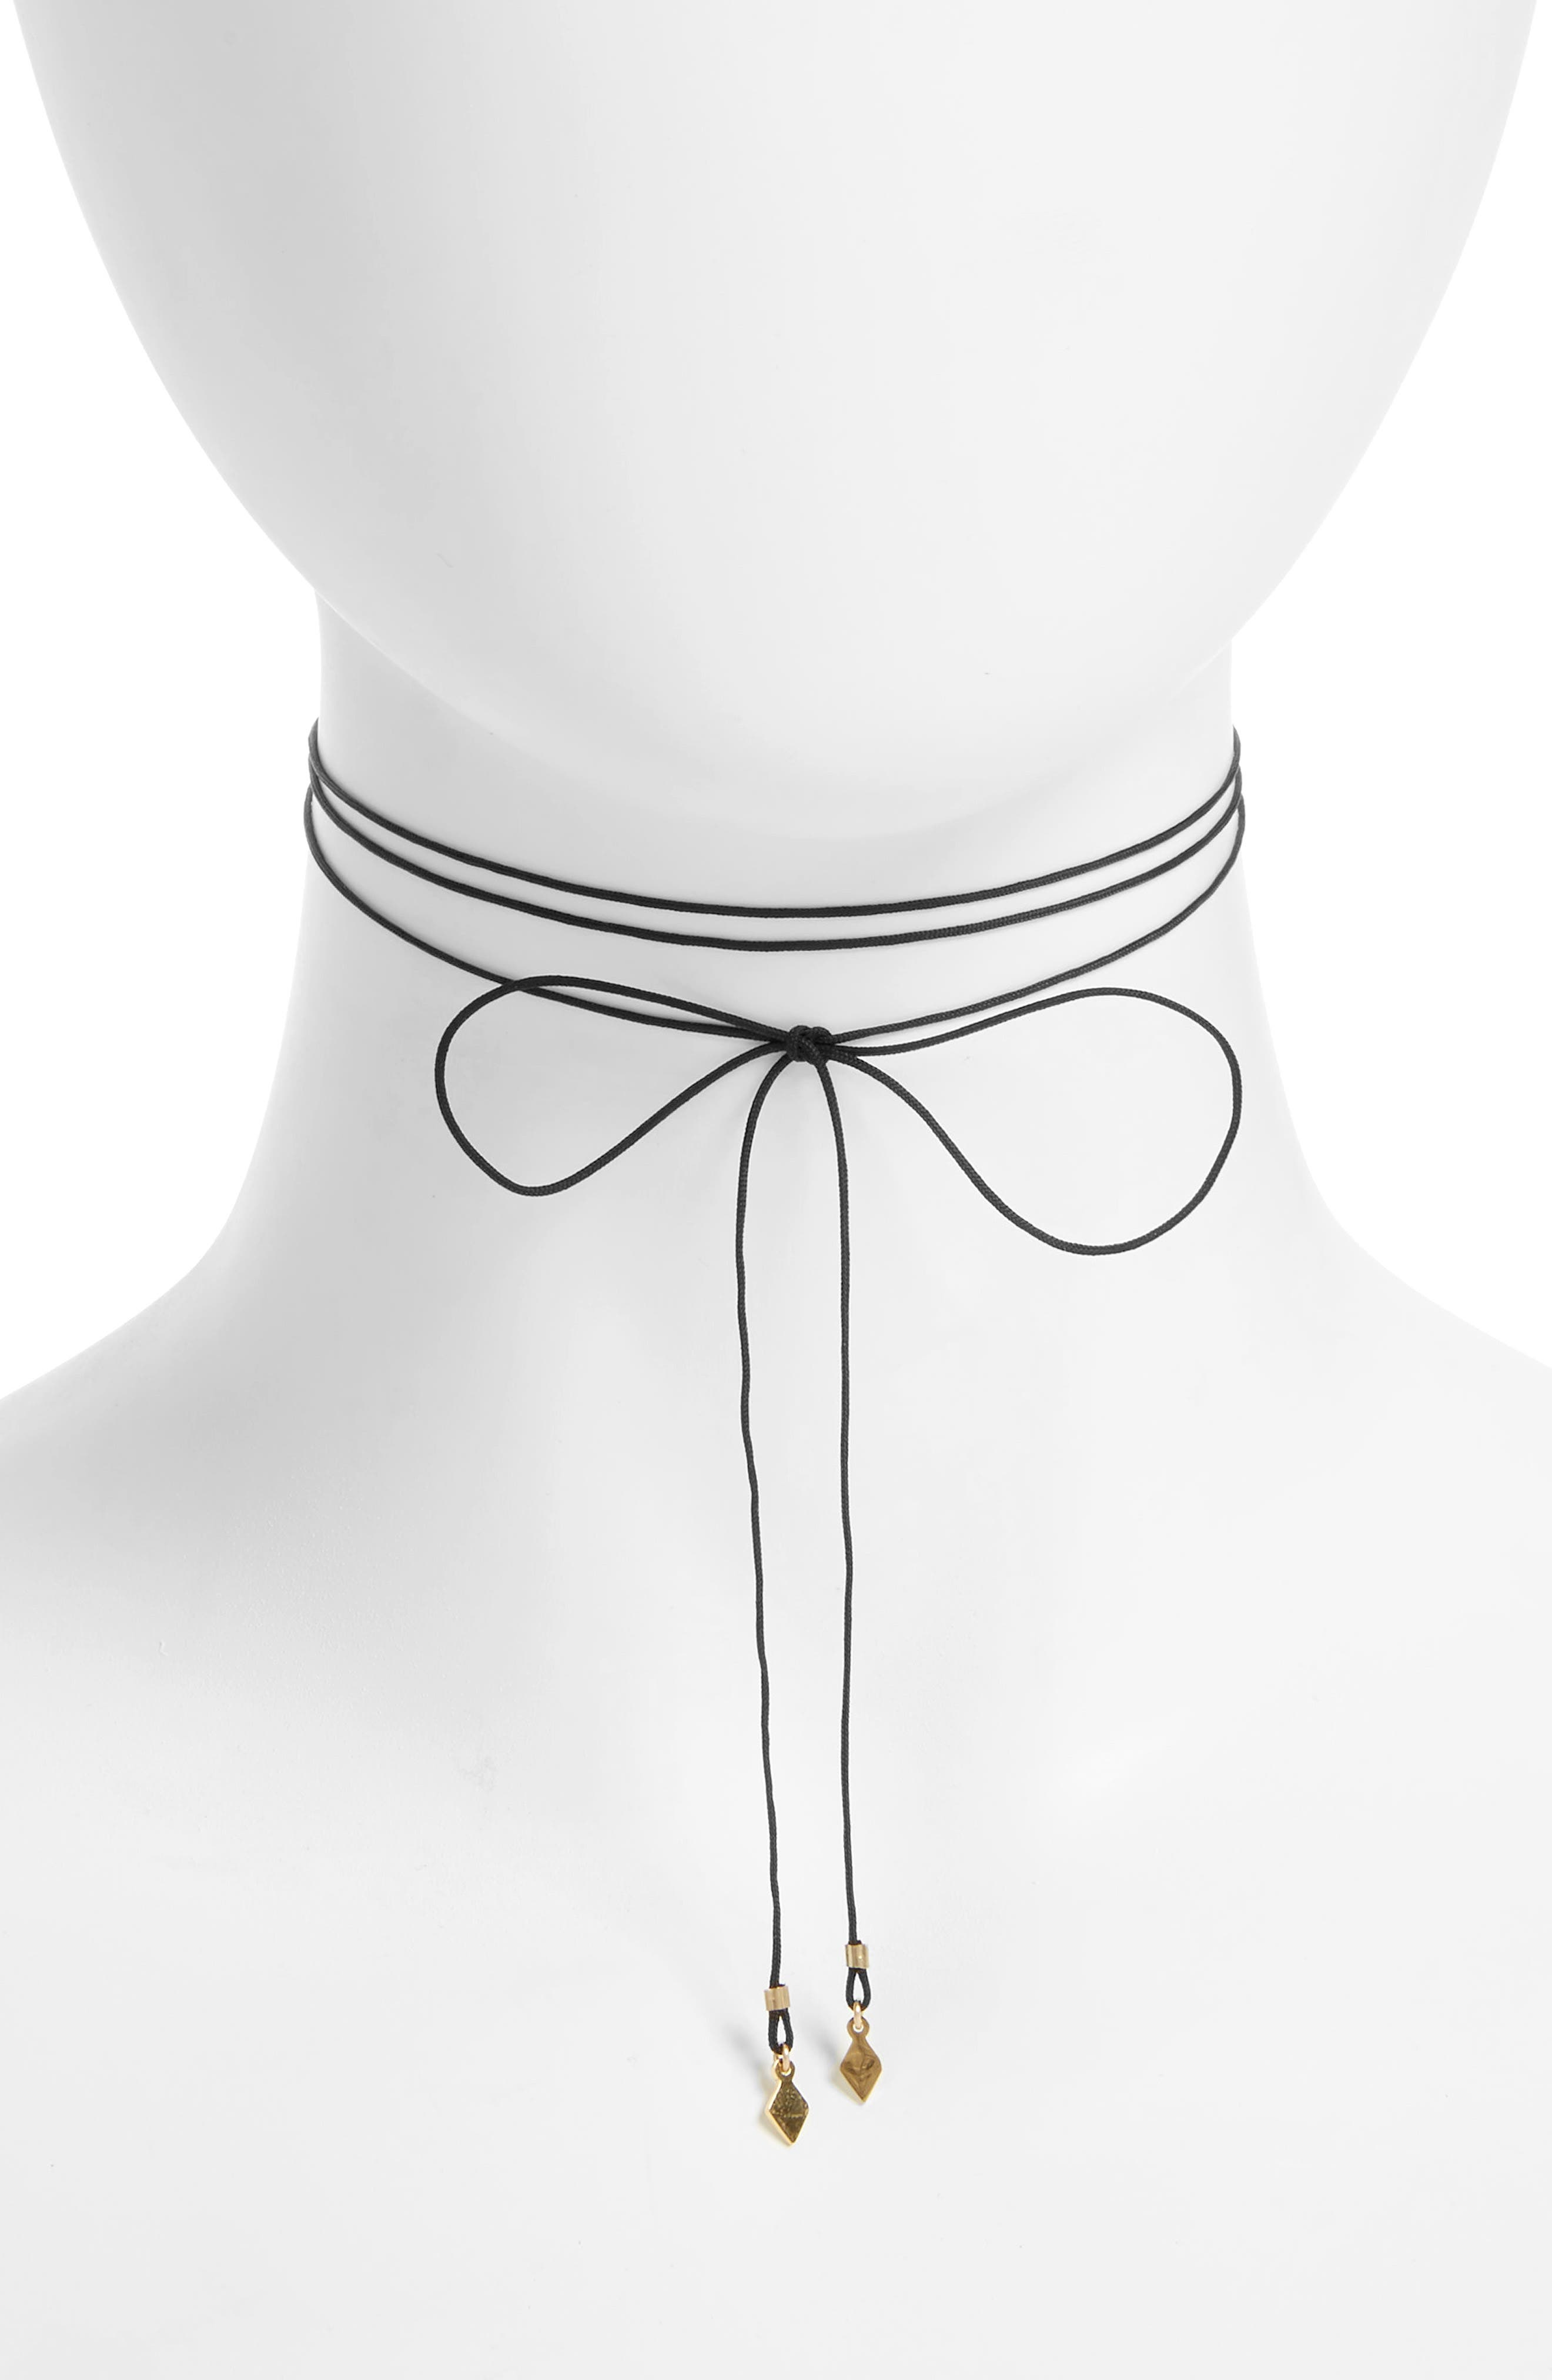 Seoul Little Maive Tiny Double Diamond Bow Tie Choker